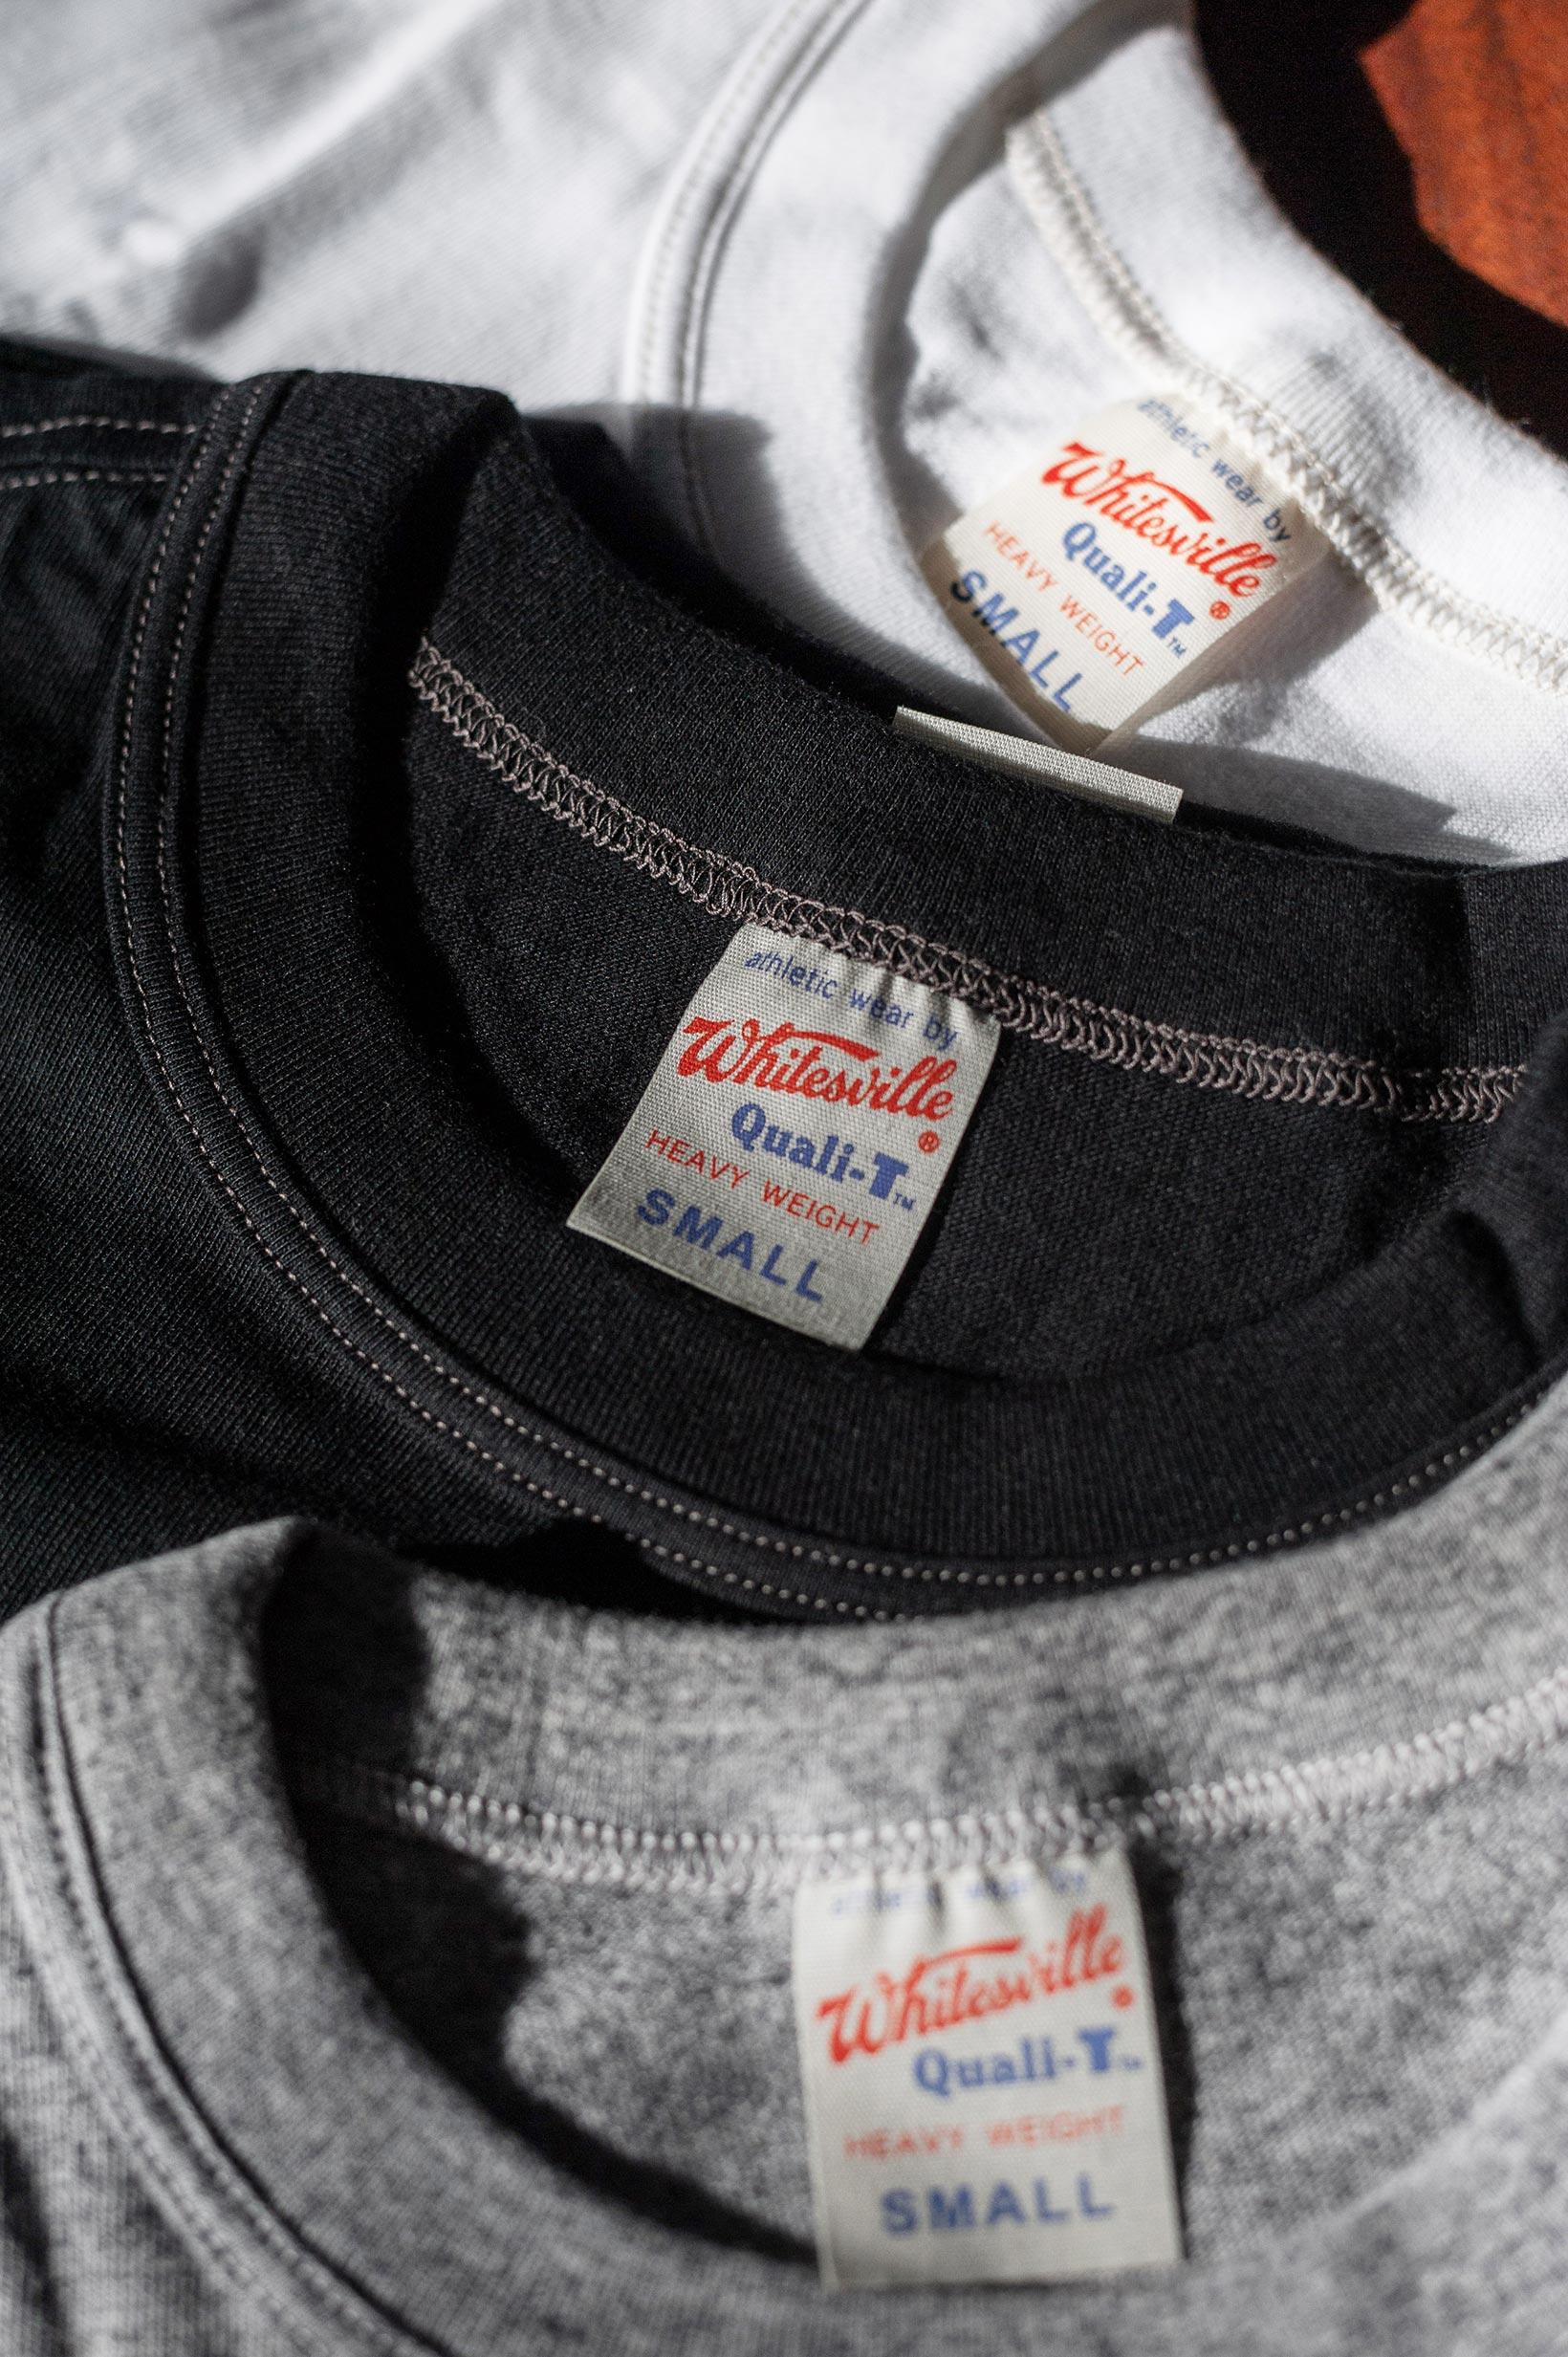 Whitesville Japanese Made T-Shirts - White (2-Pack) - Image 10